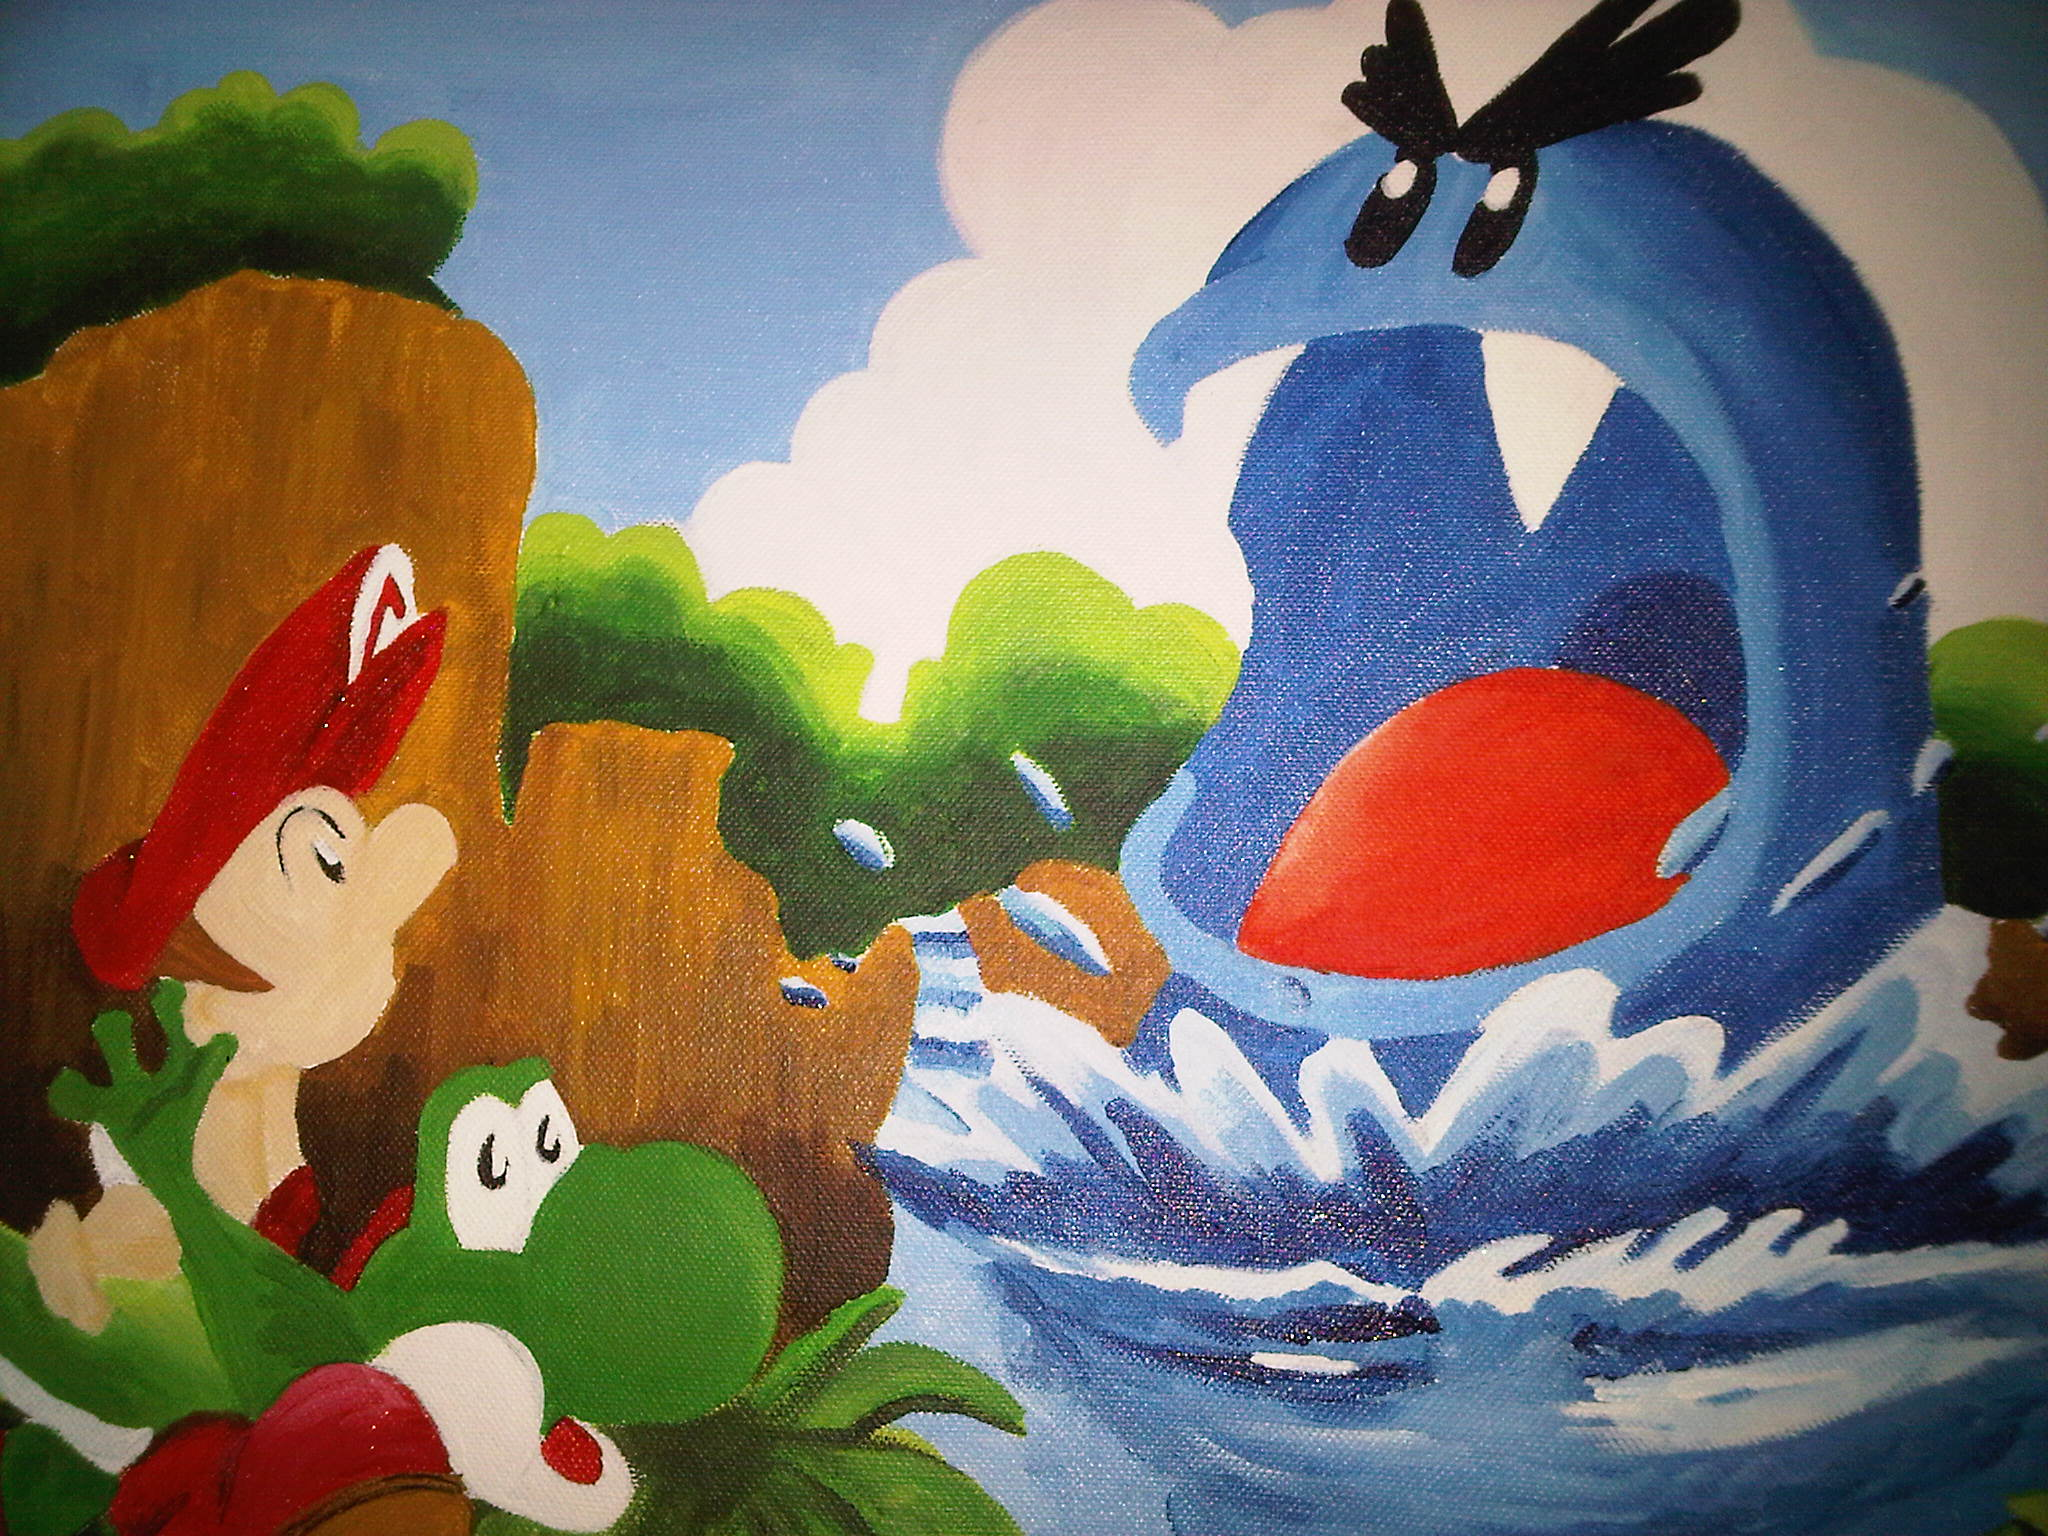 super mario world 2 yoshi's island hd wallpaper